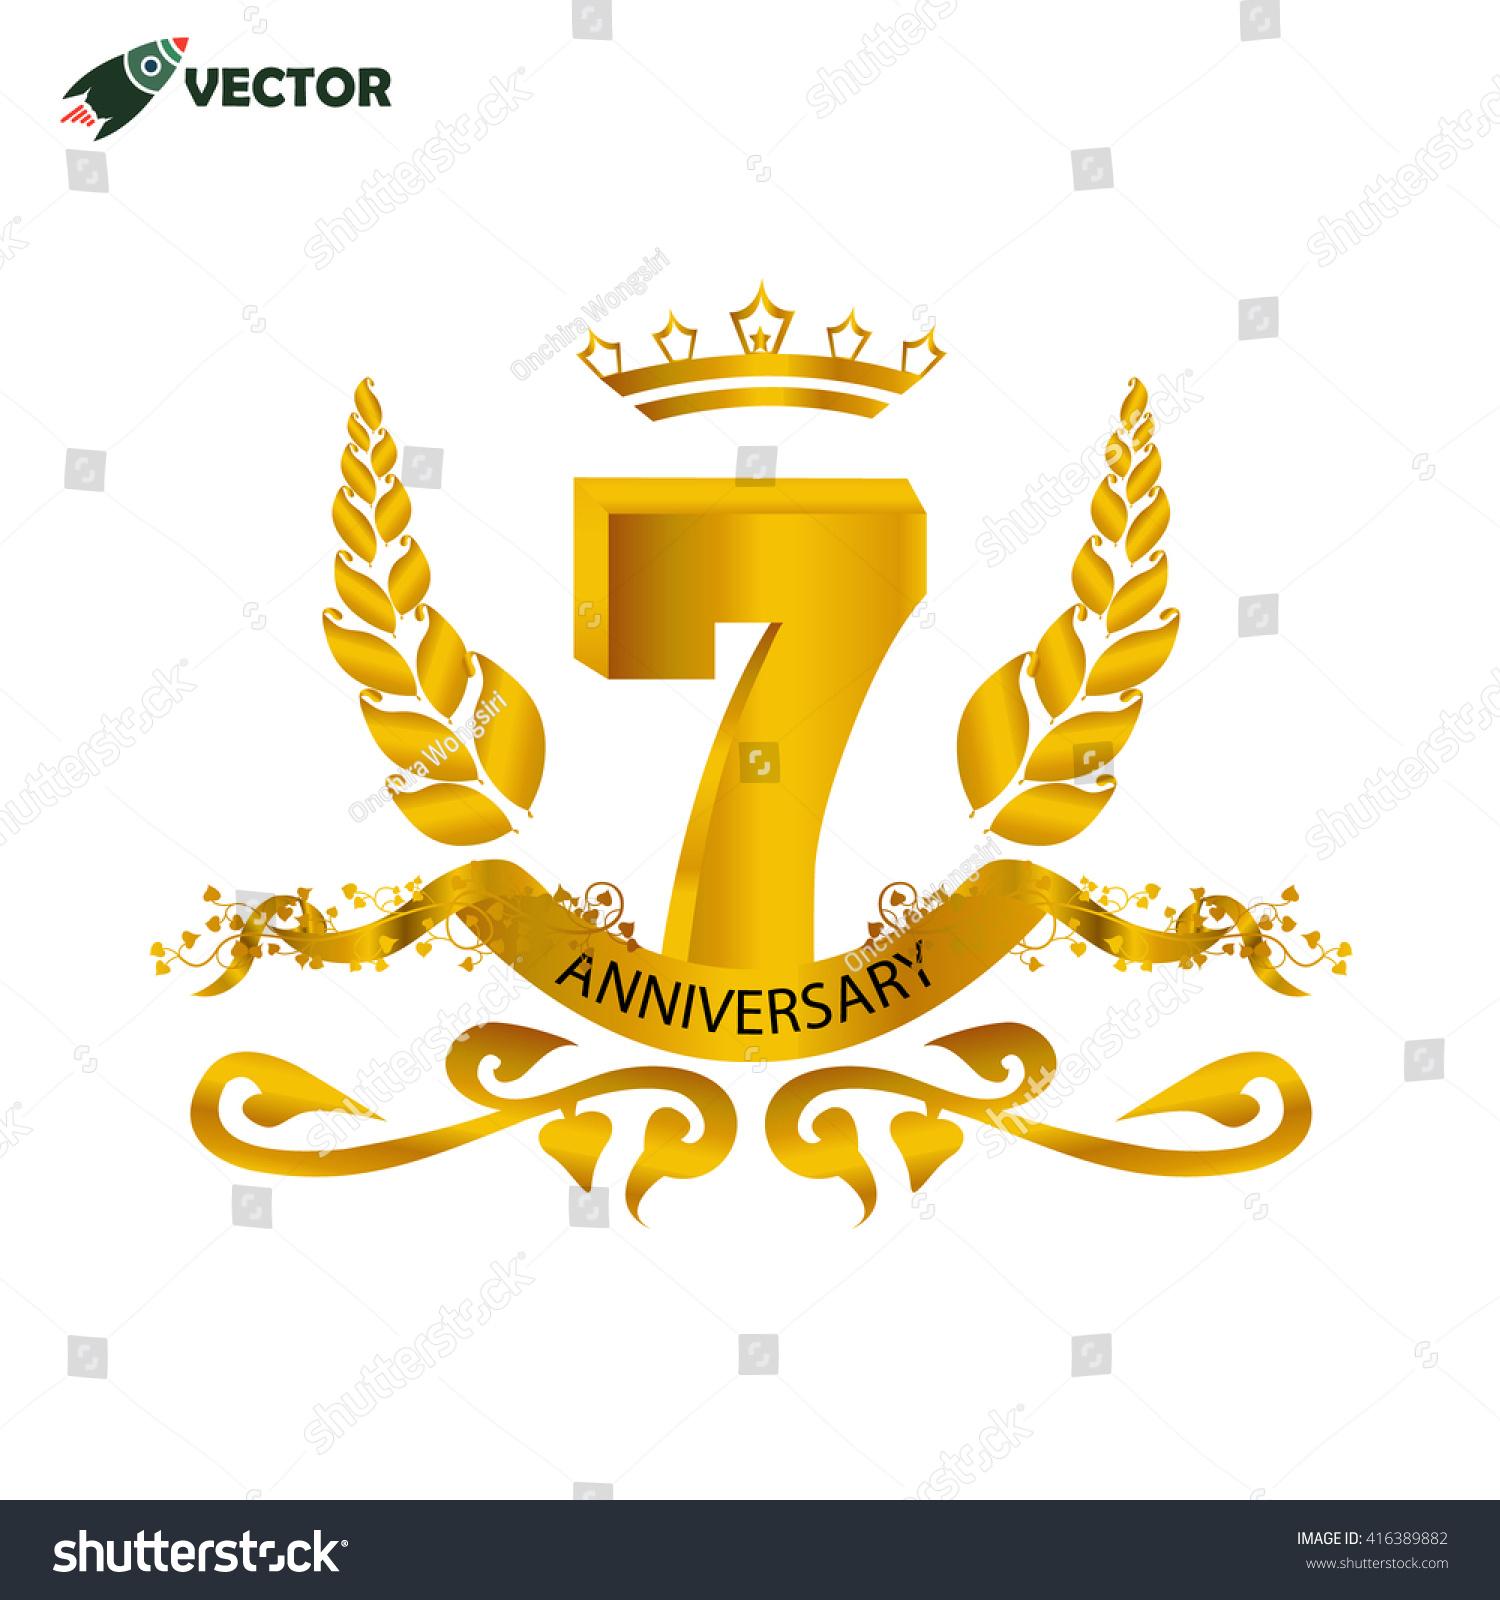 7th years anniversary celebration wedding birthday stock vector 7th years anniversary celebration wedding and birthday sign and label with leaves rbbon buycottarizona